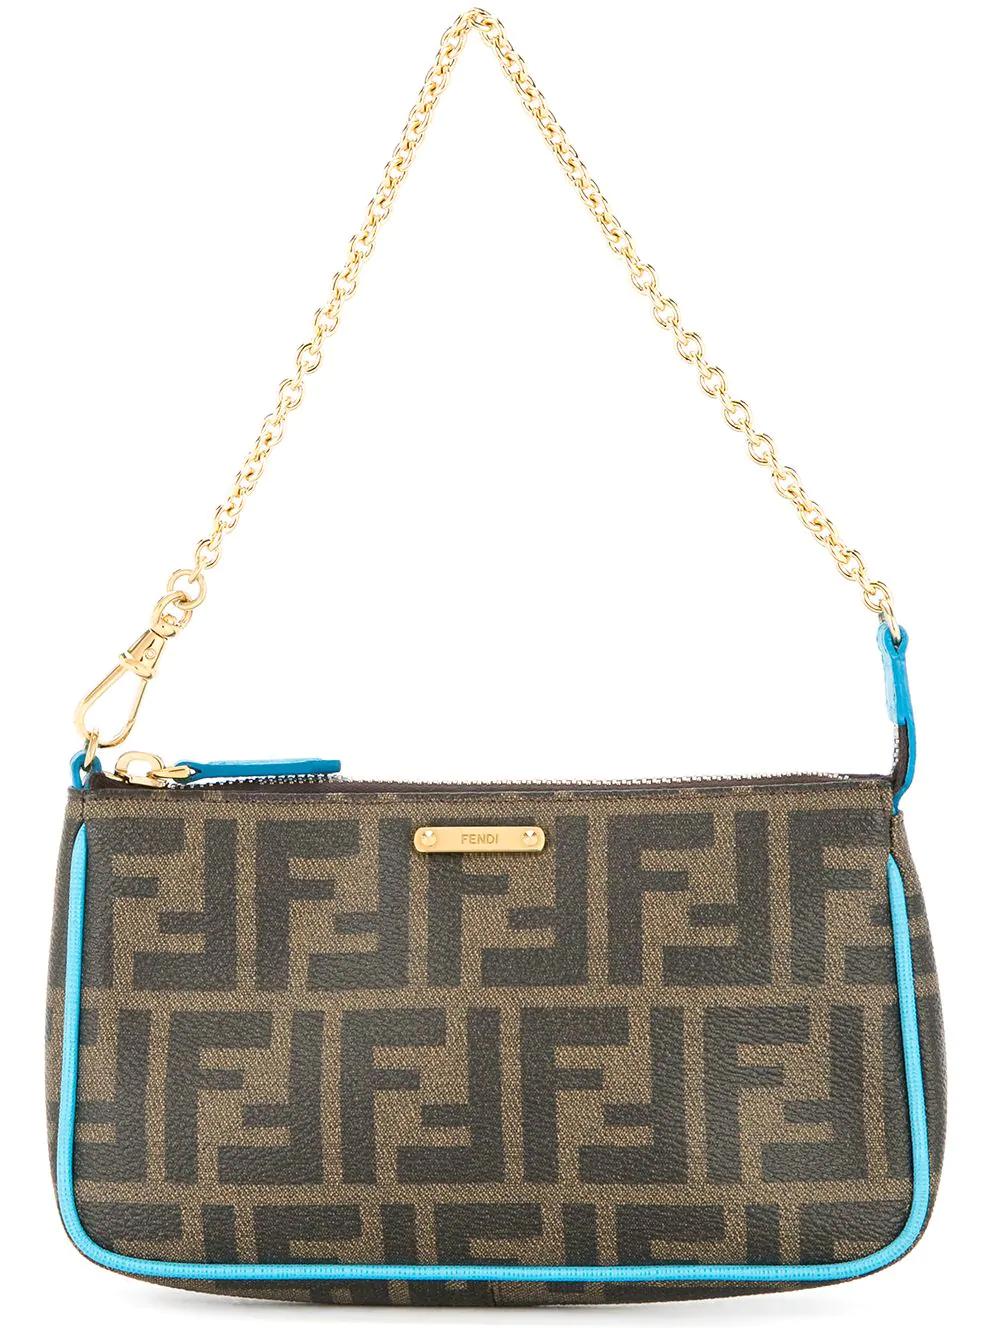 4b35f40c055 Fendi Vintage Zucca Pattern Chain Hand Bag - Brown | ModeSens